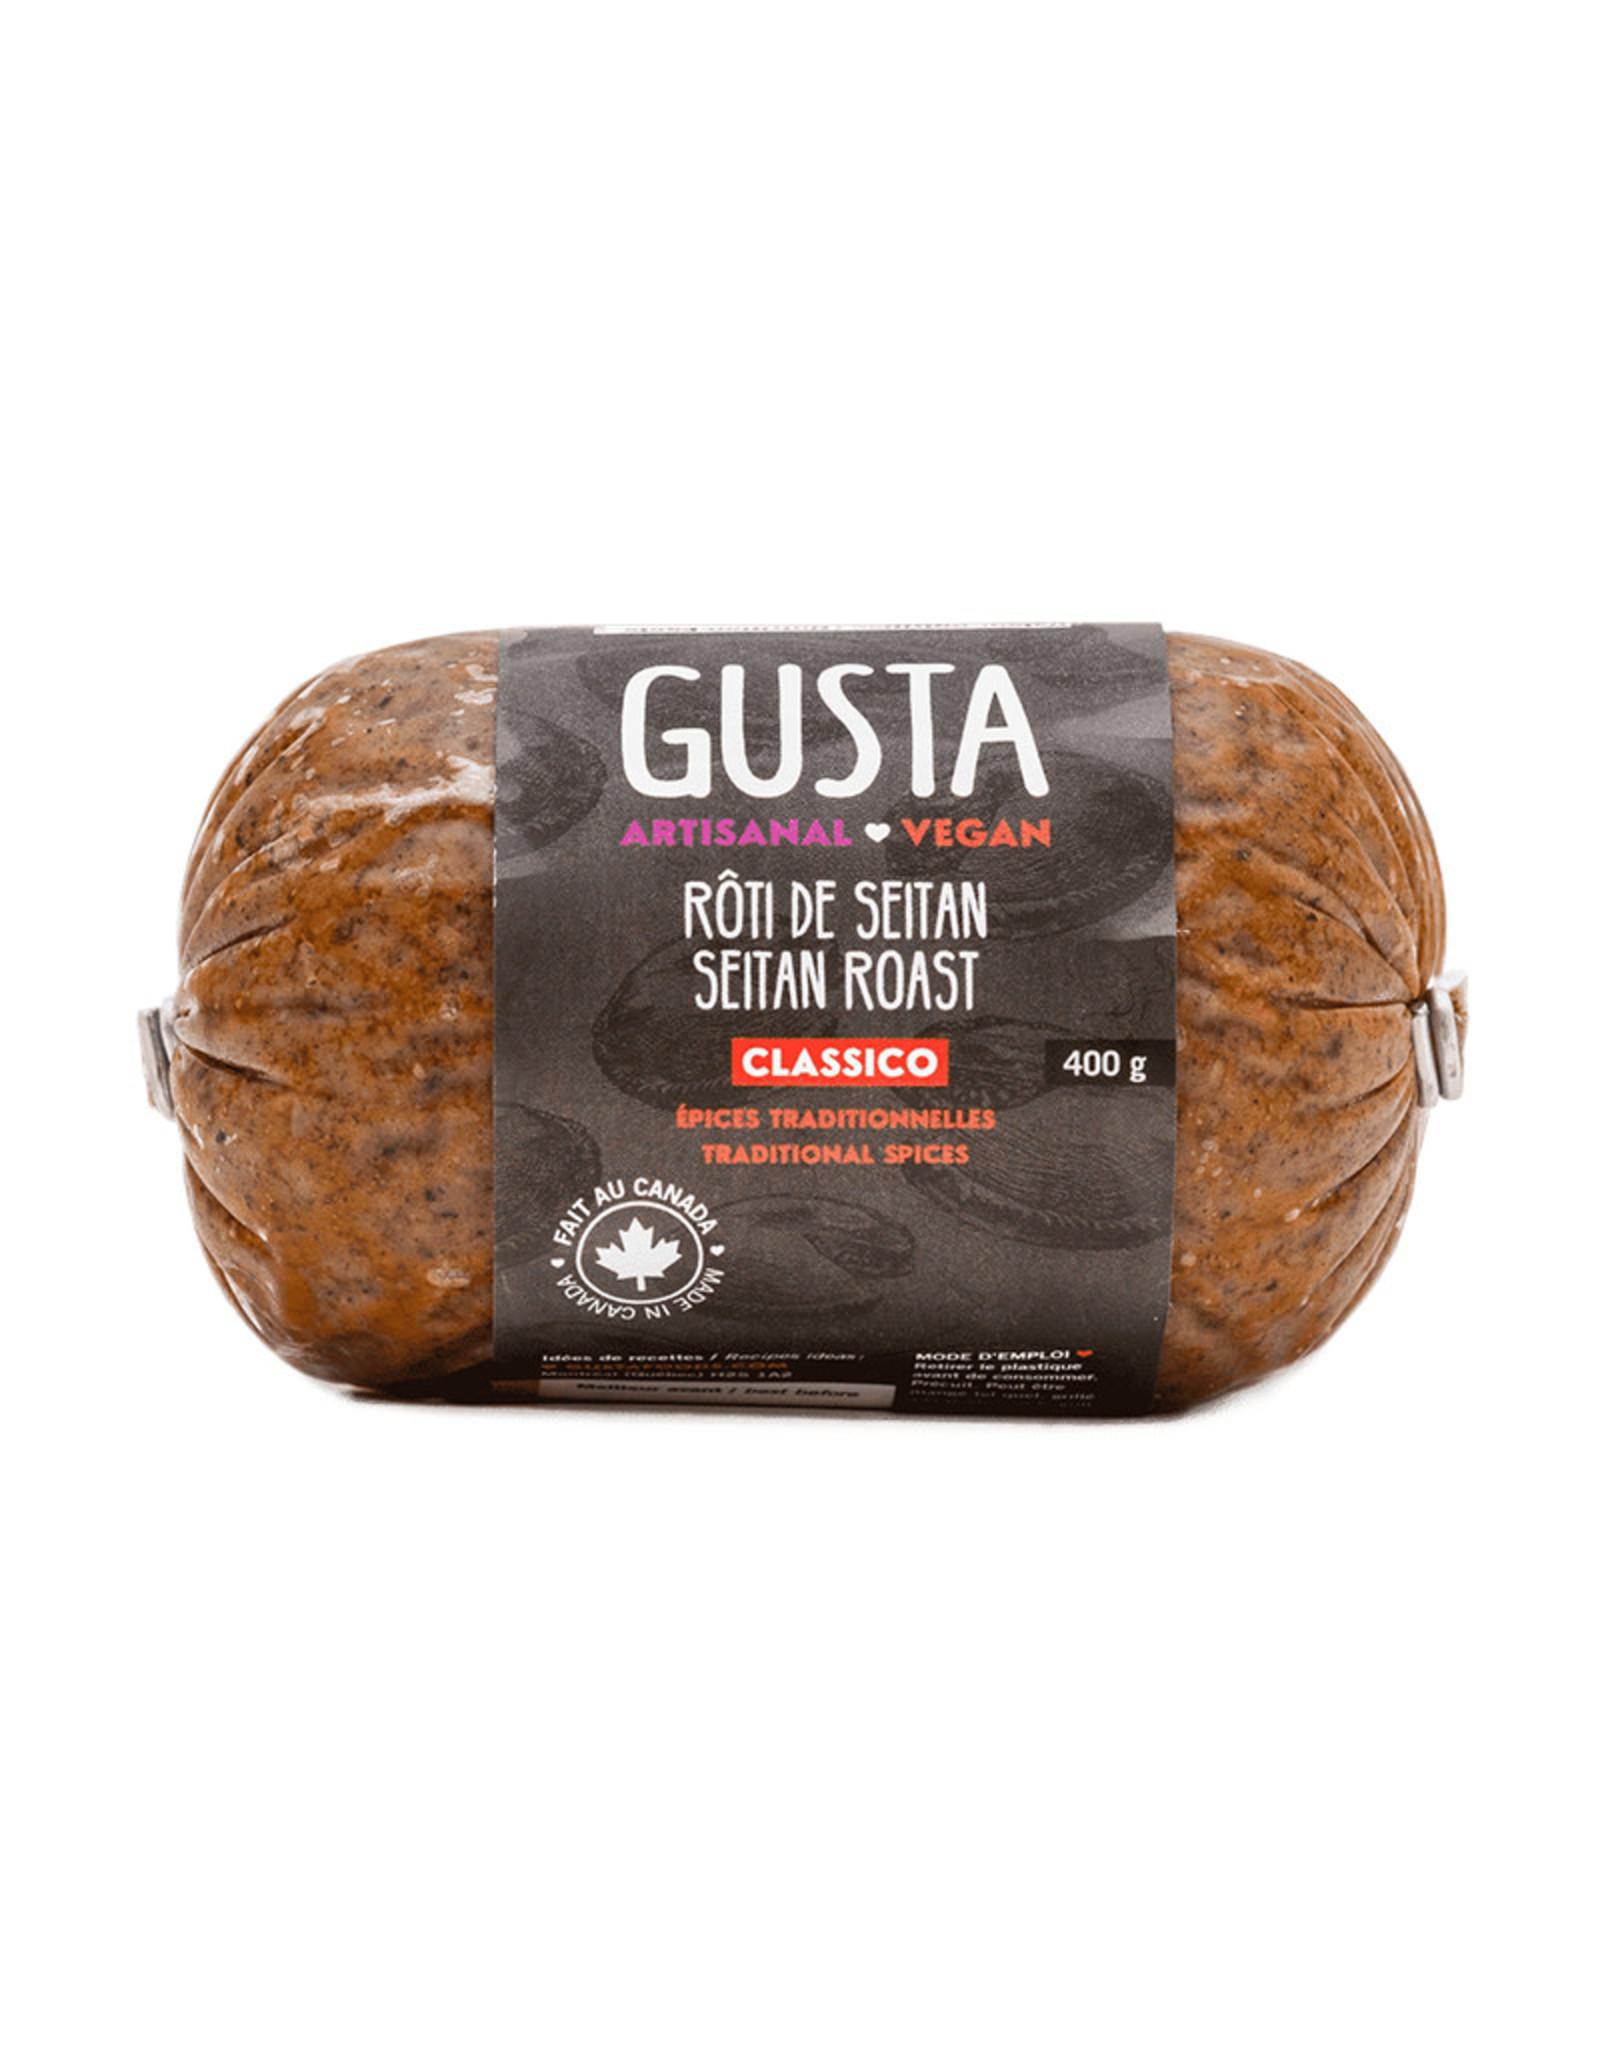 Gusta Gusta - Seitan Roast, Classico